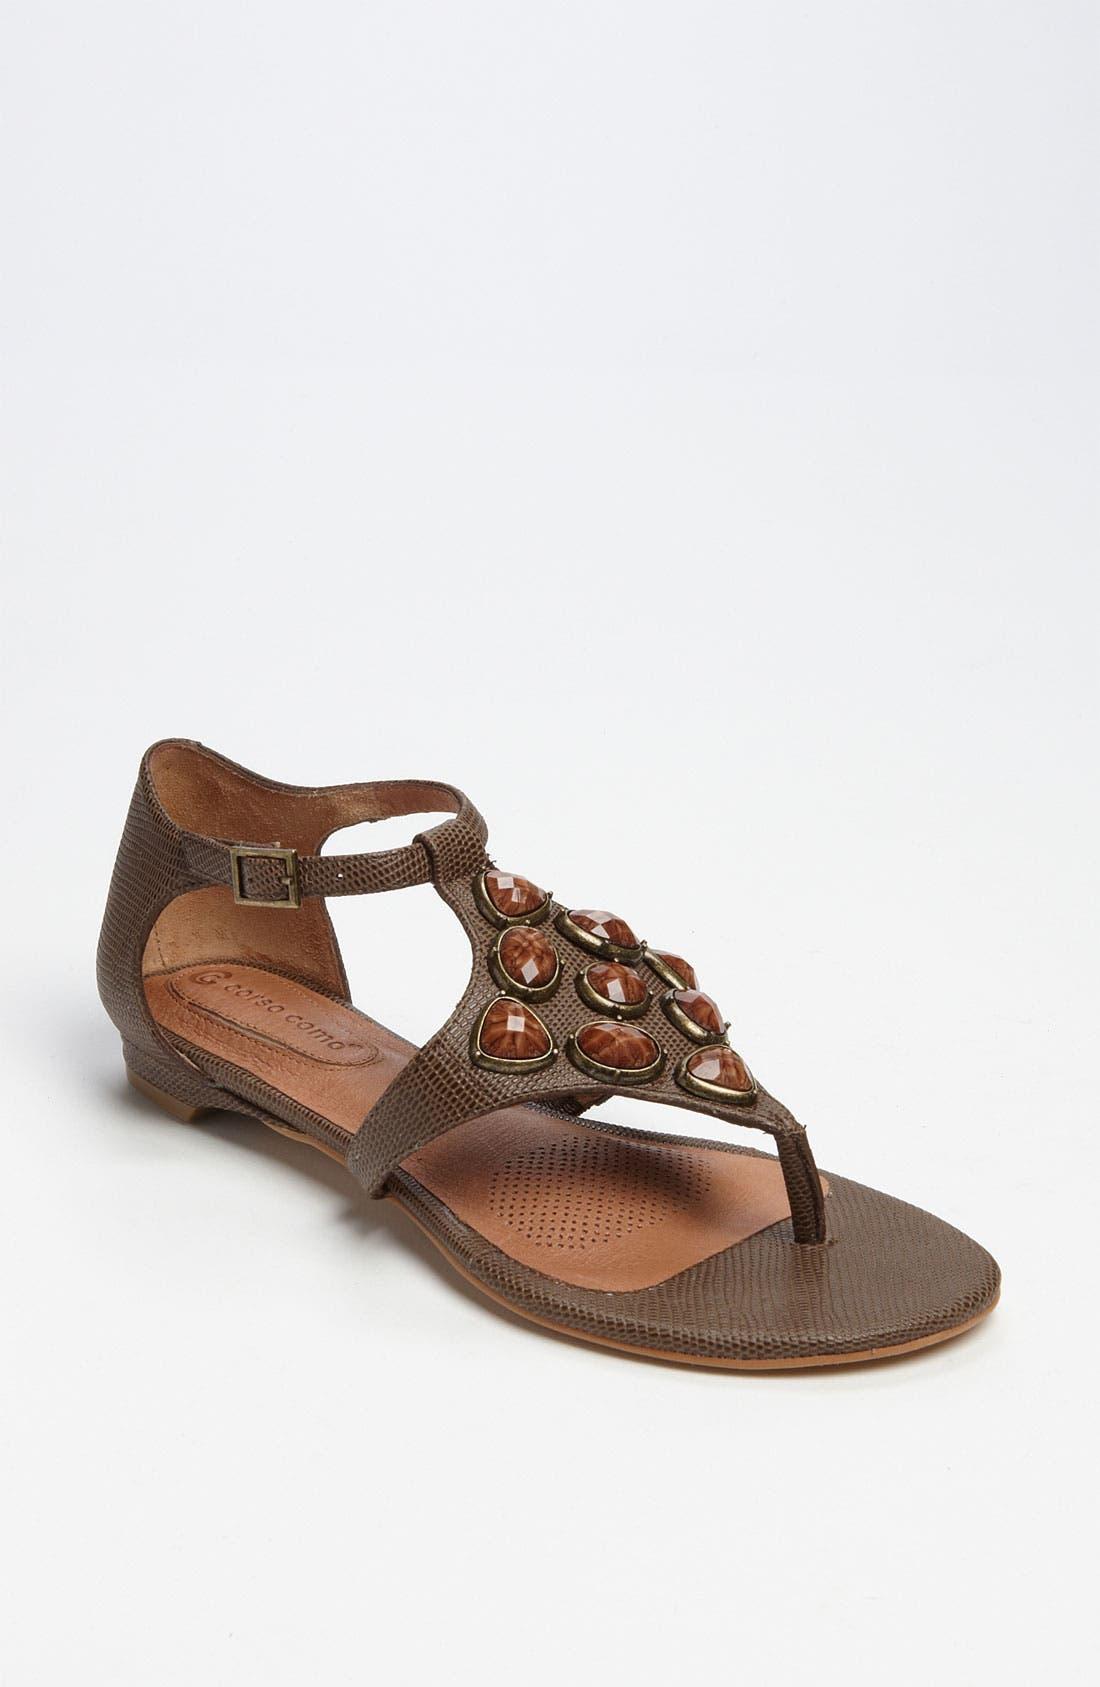 Alternate Image 1 Selected - Corso Como 'Folic' Sandal